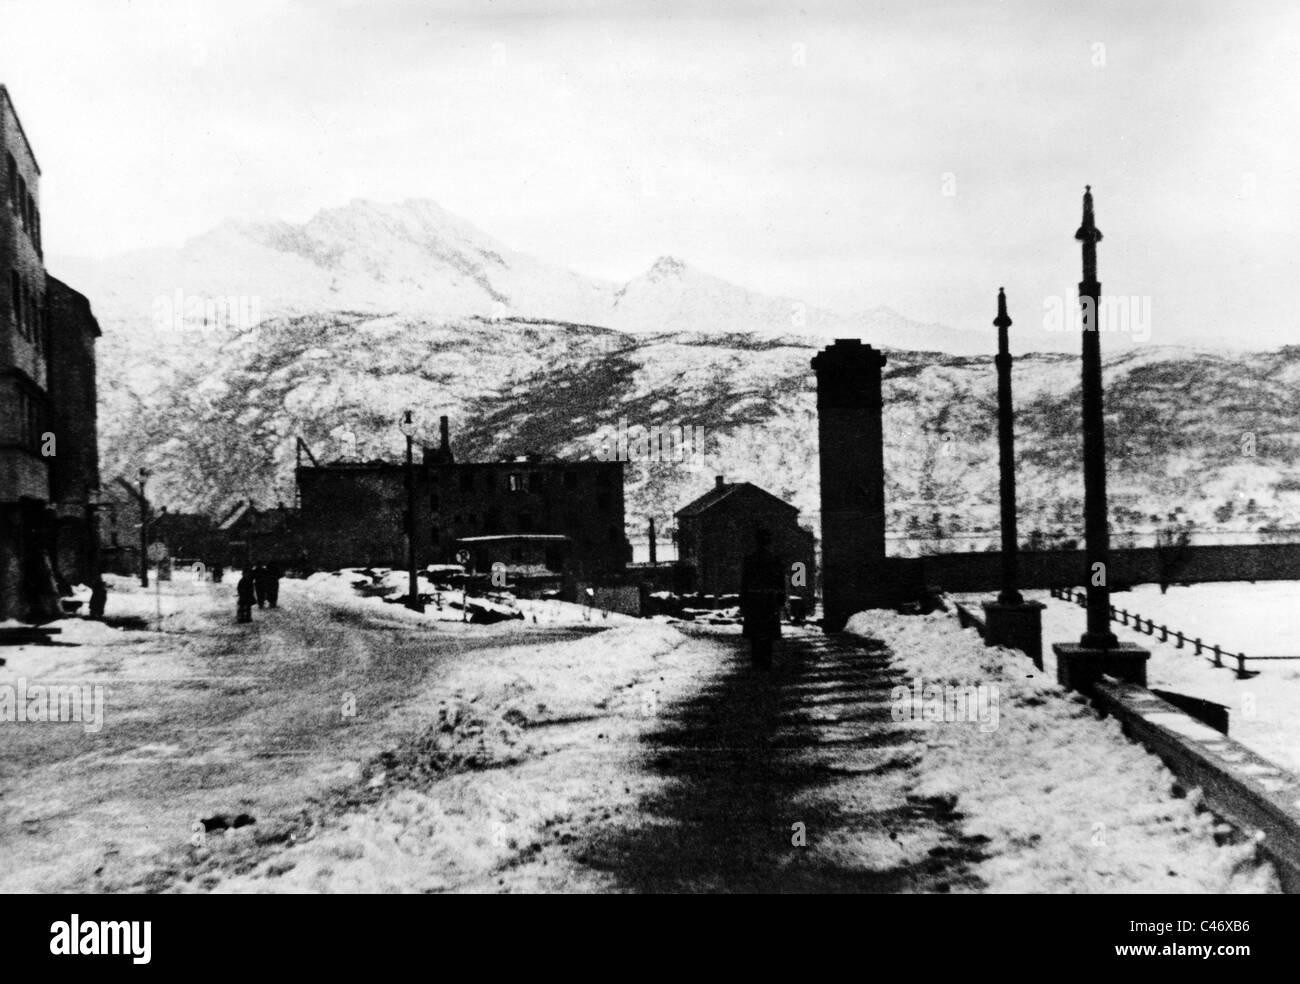 Second World War: Norwegian campaign. Battles of Narvik, 1940 - Stock Image